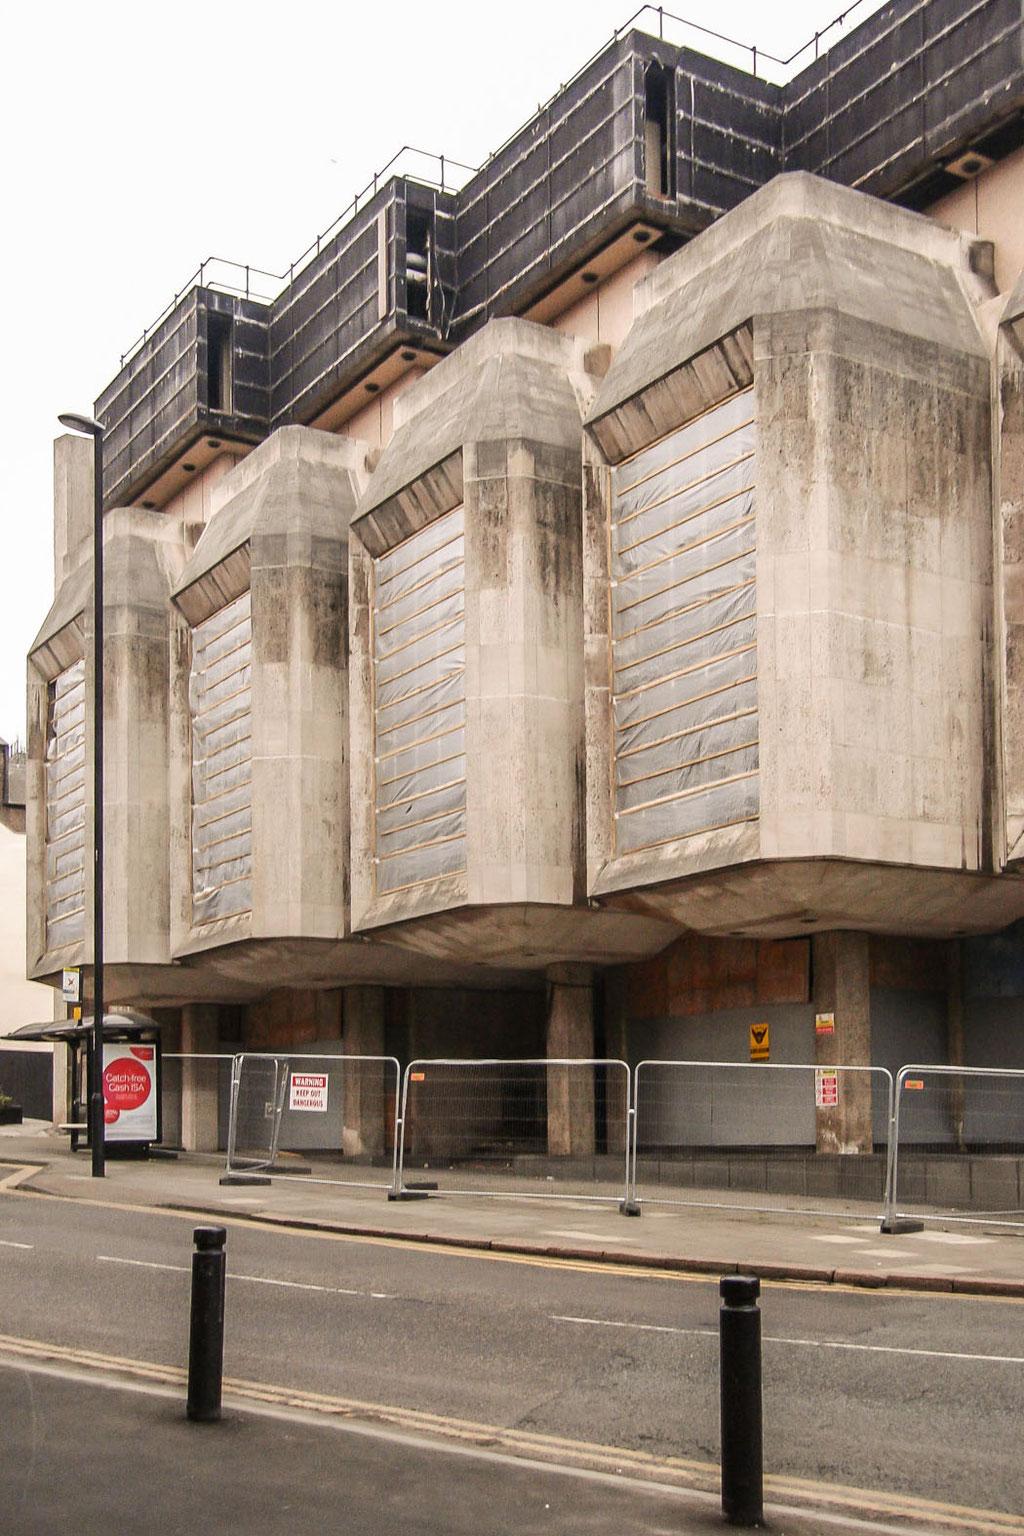 Bank Of England (Sir Basil Spence, Fitzroy, Robinson & Partners), abgerissen/demolished 2012, Newcastle upon Tyne (UK)